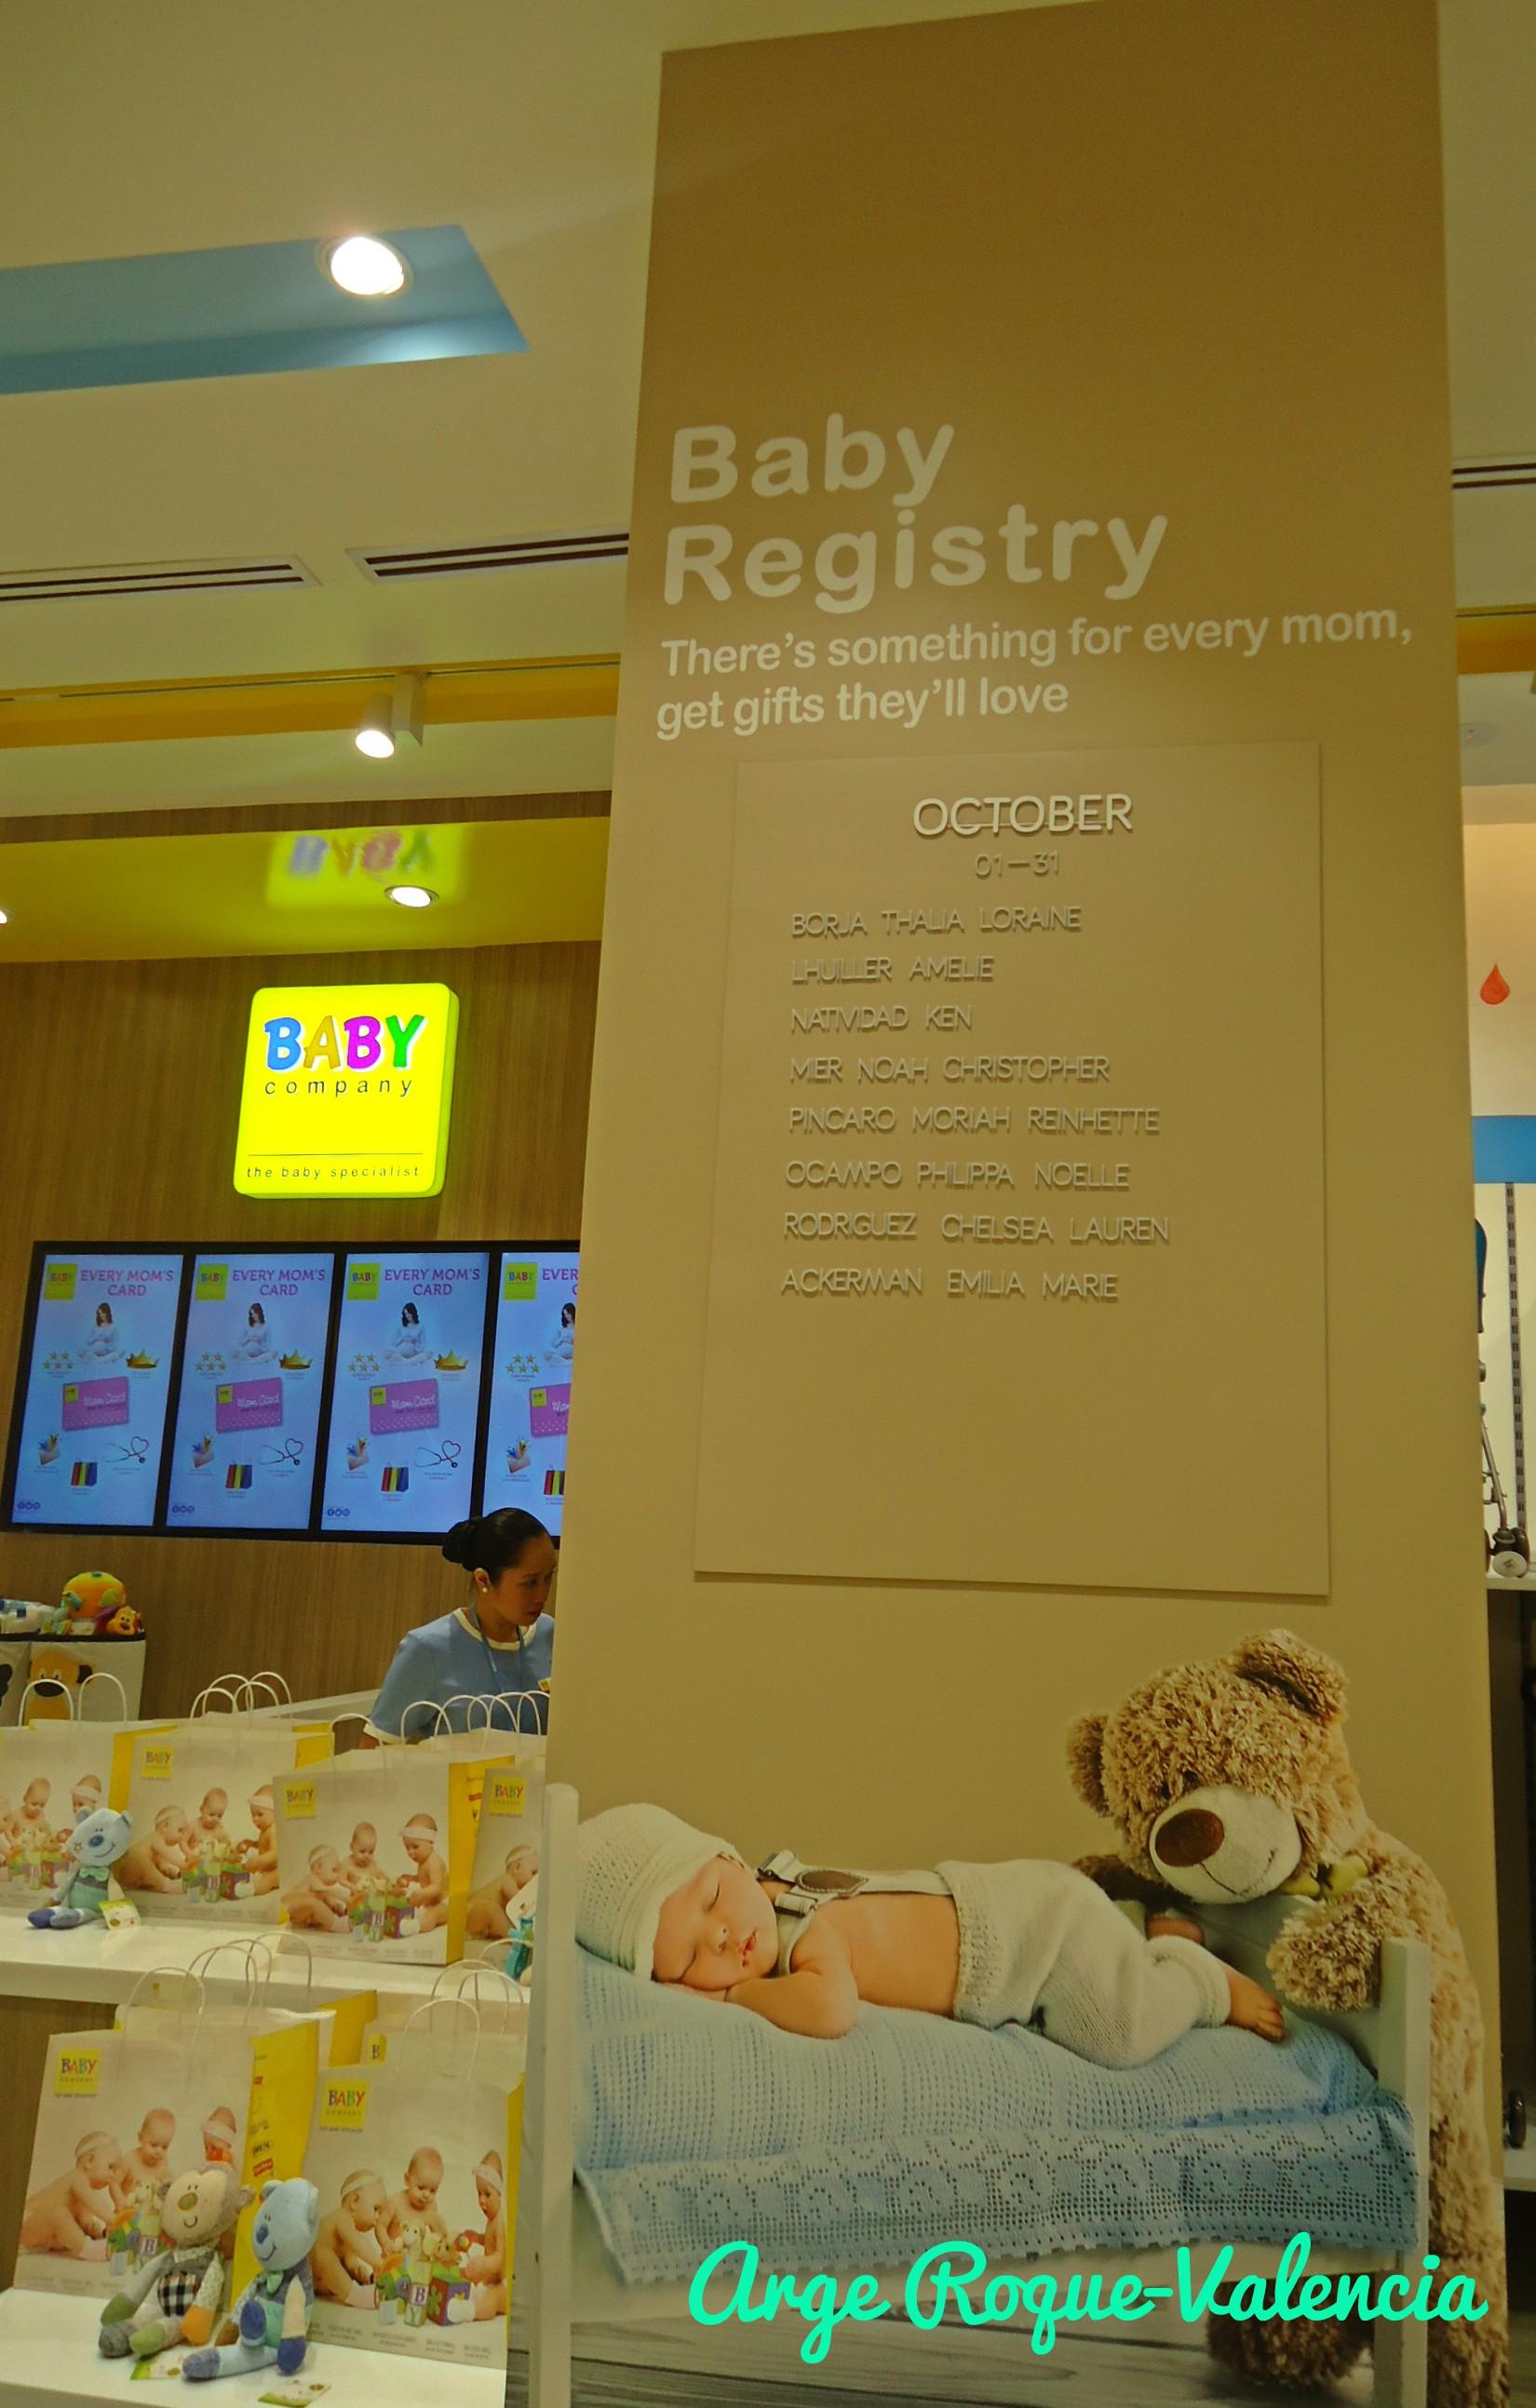 Baby Company - Baby Registry